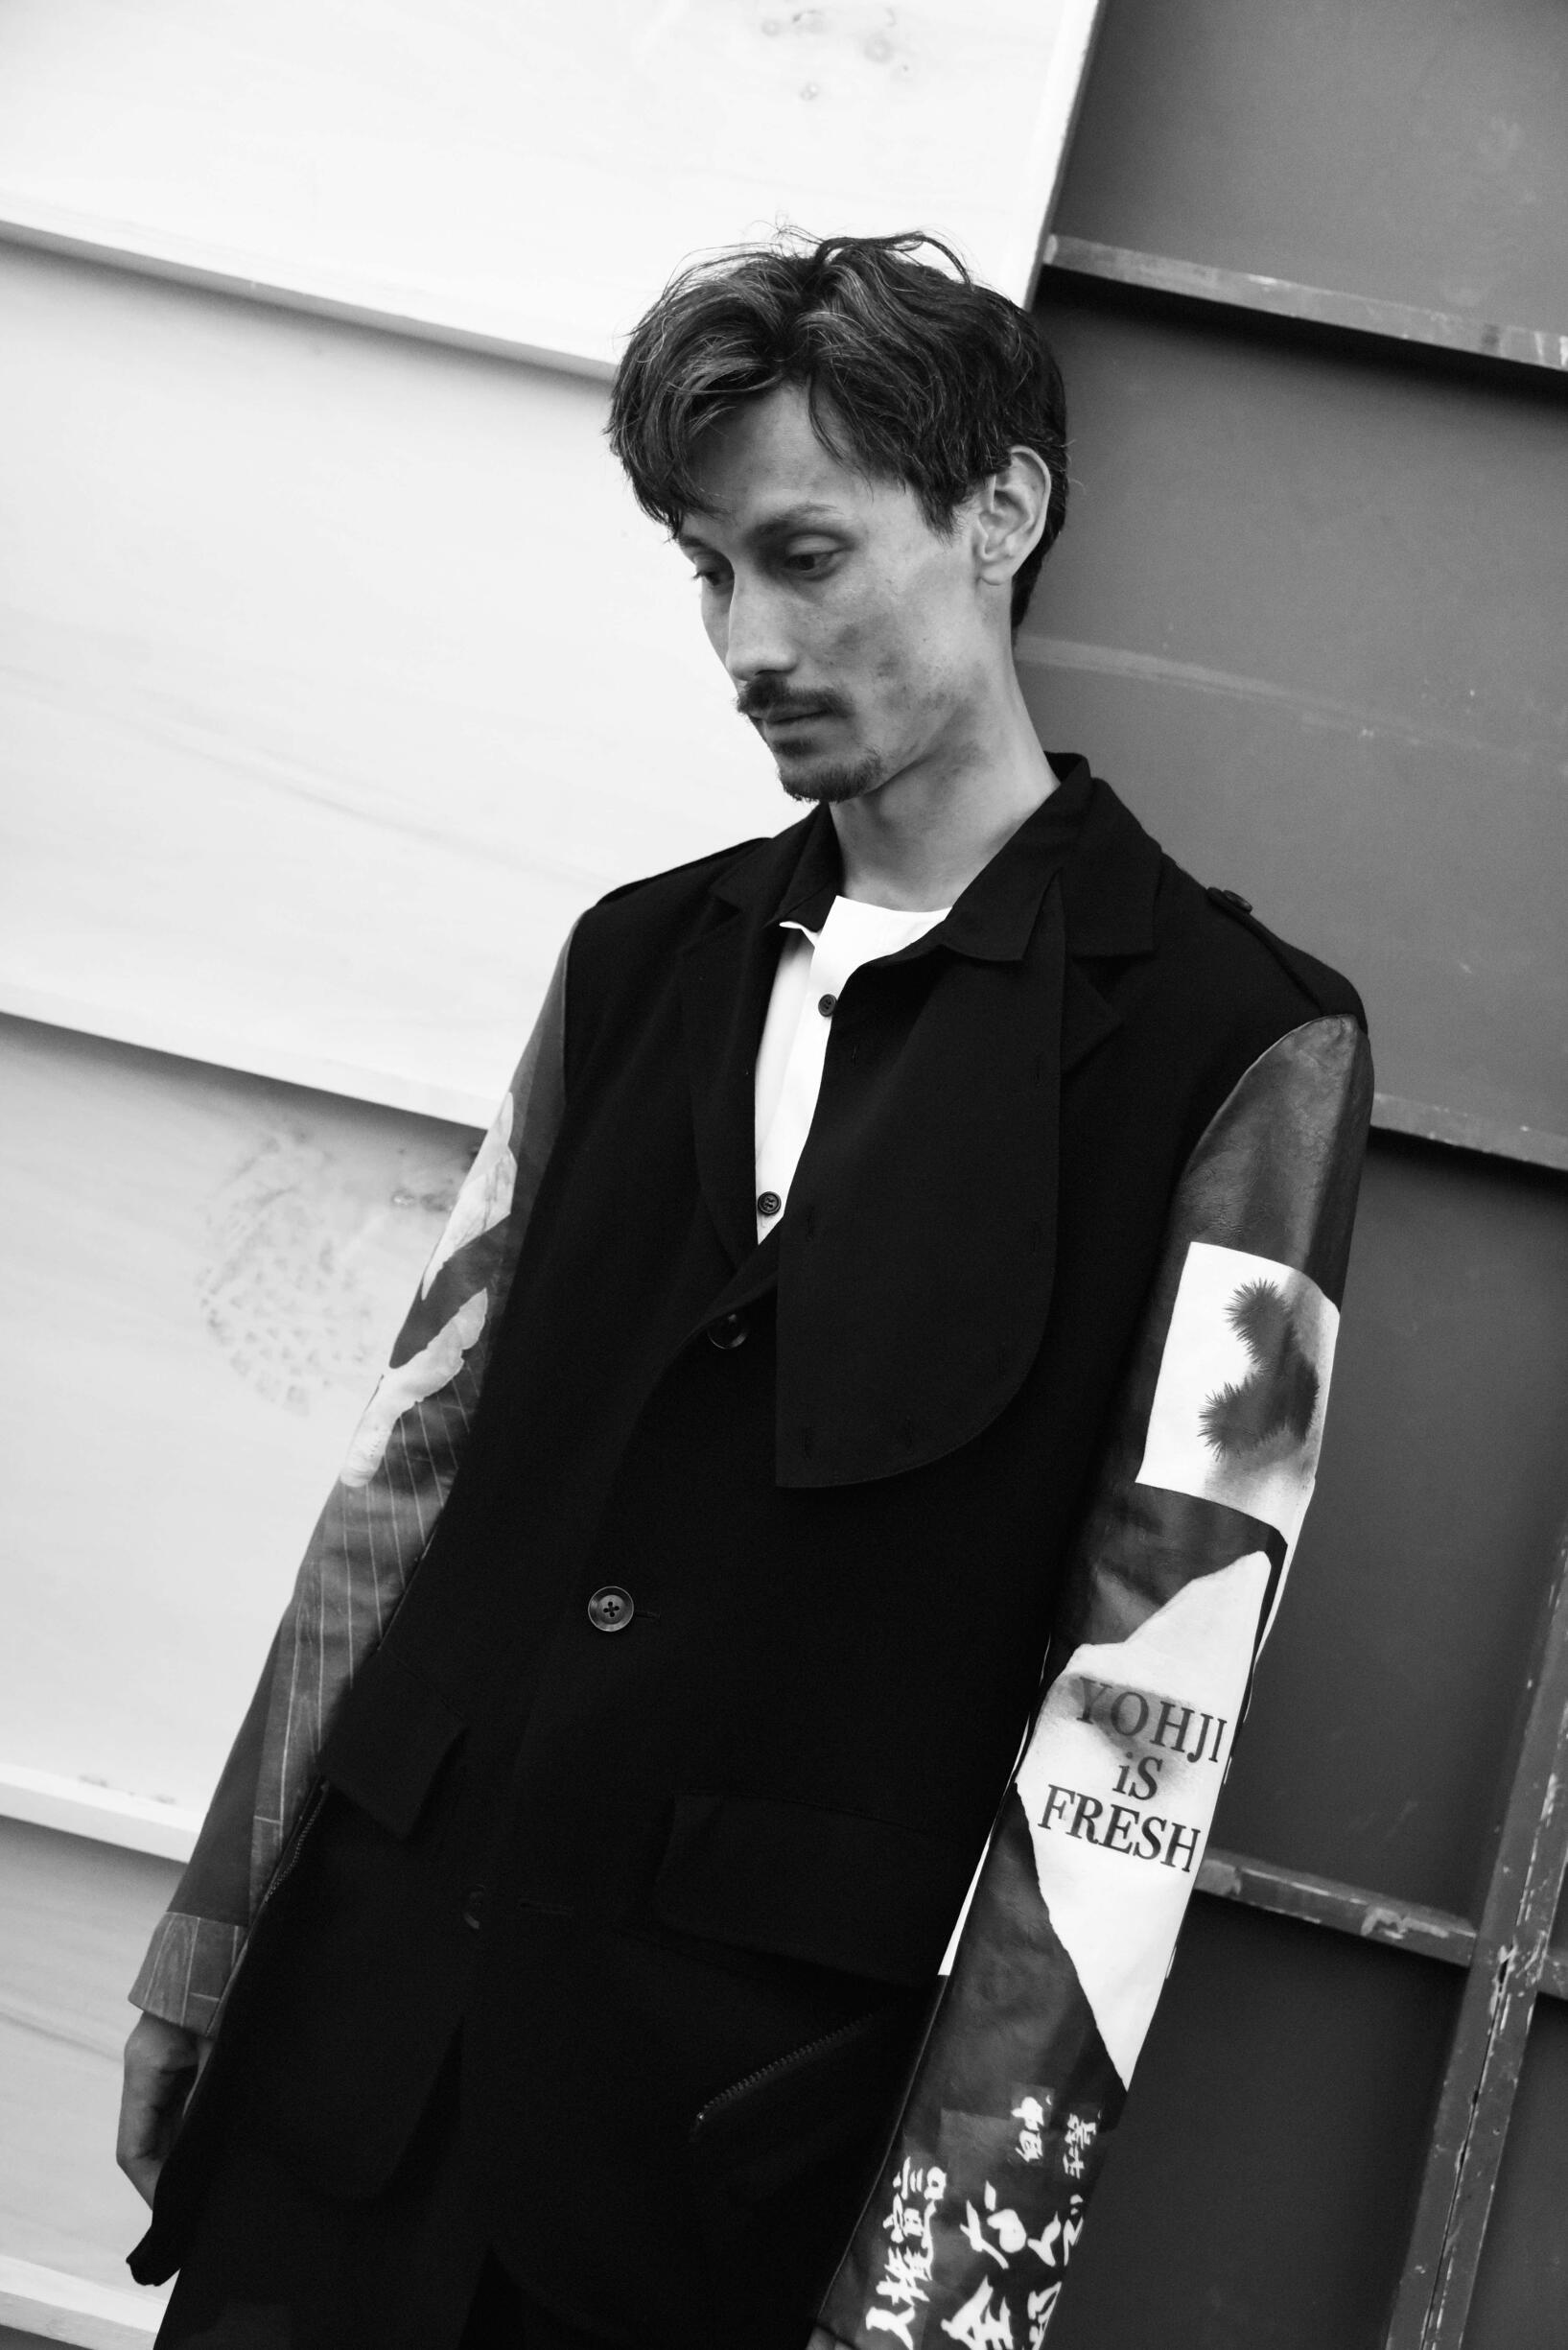 Backstage Yohji Yamamoto Model 2019